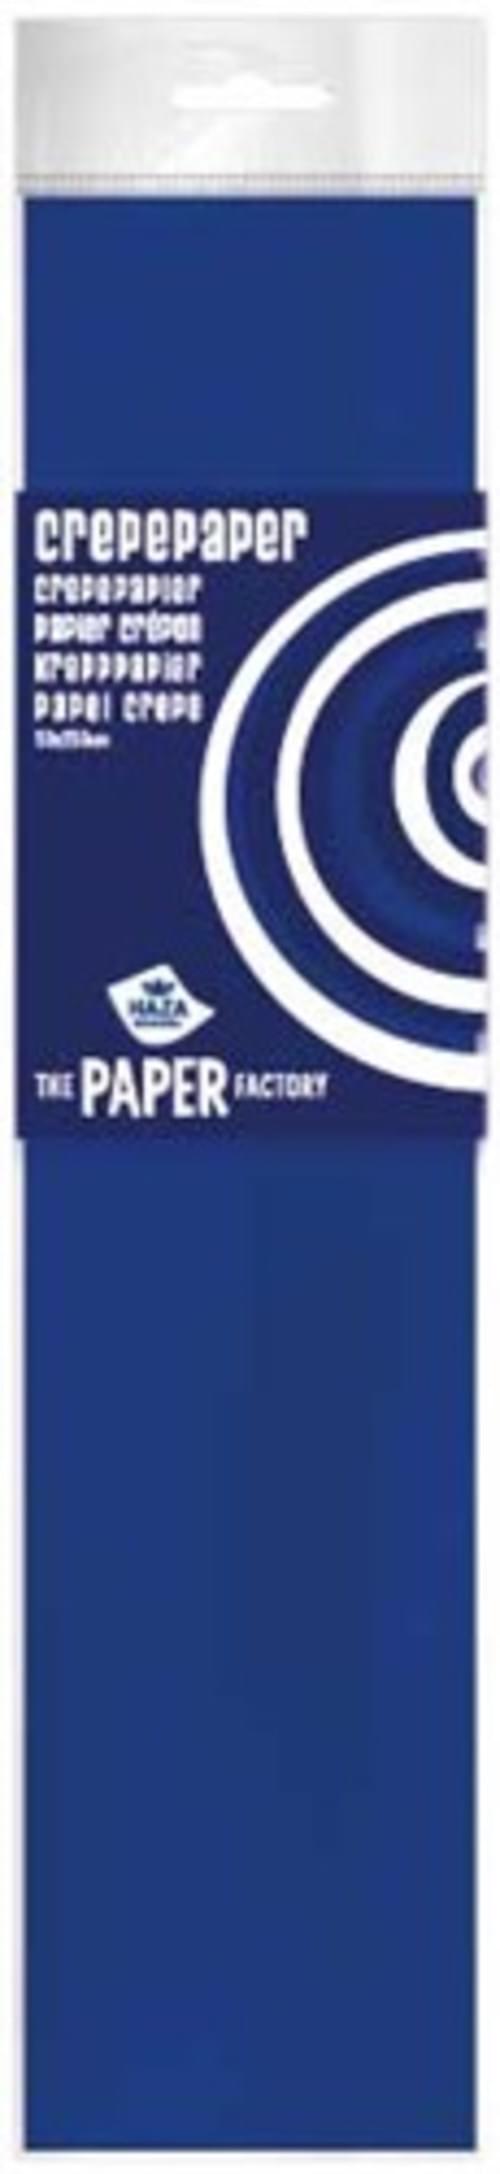 Crepe Paper Marine blue  10pk